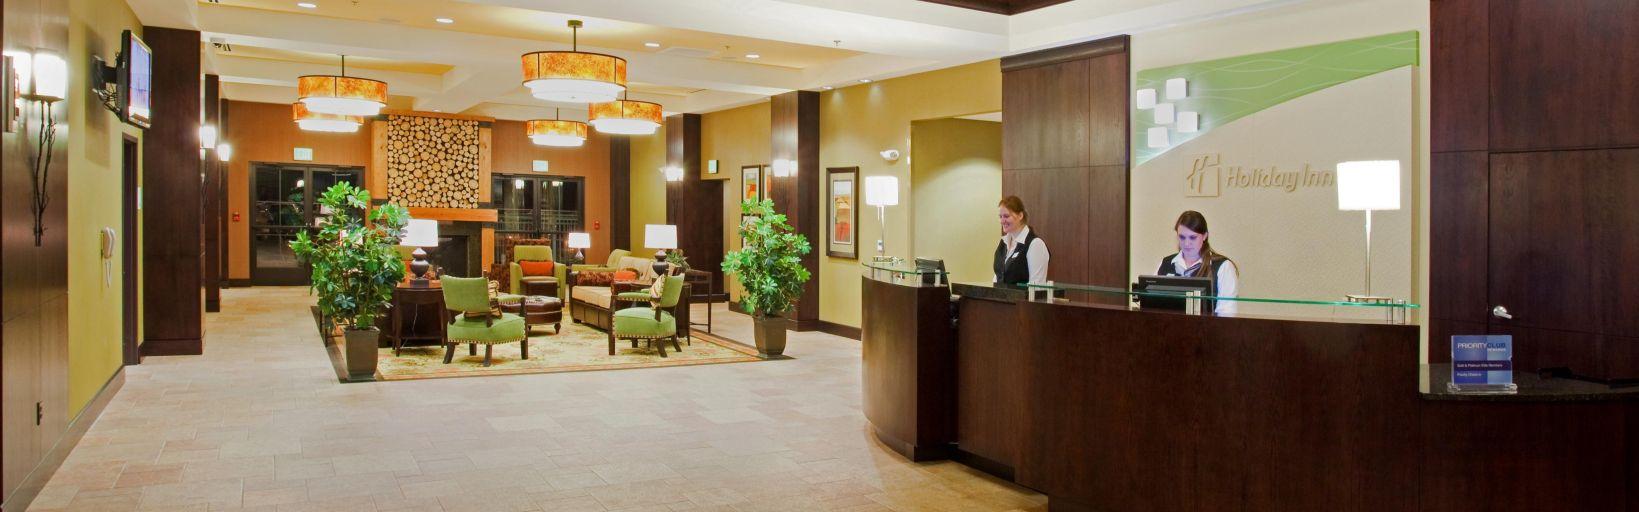 Ious Hotel Lobby